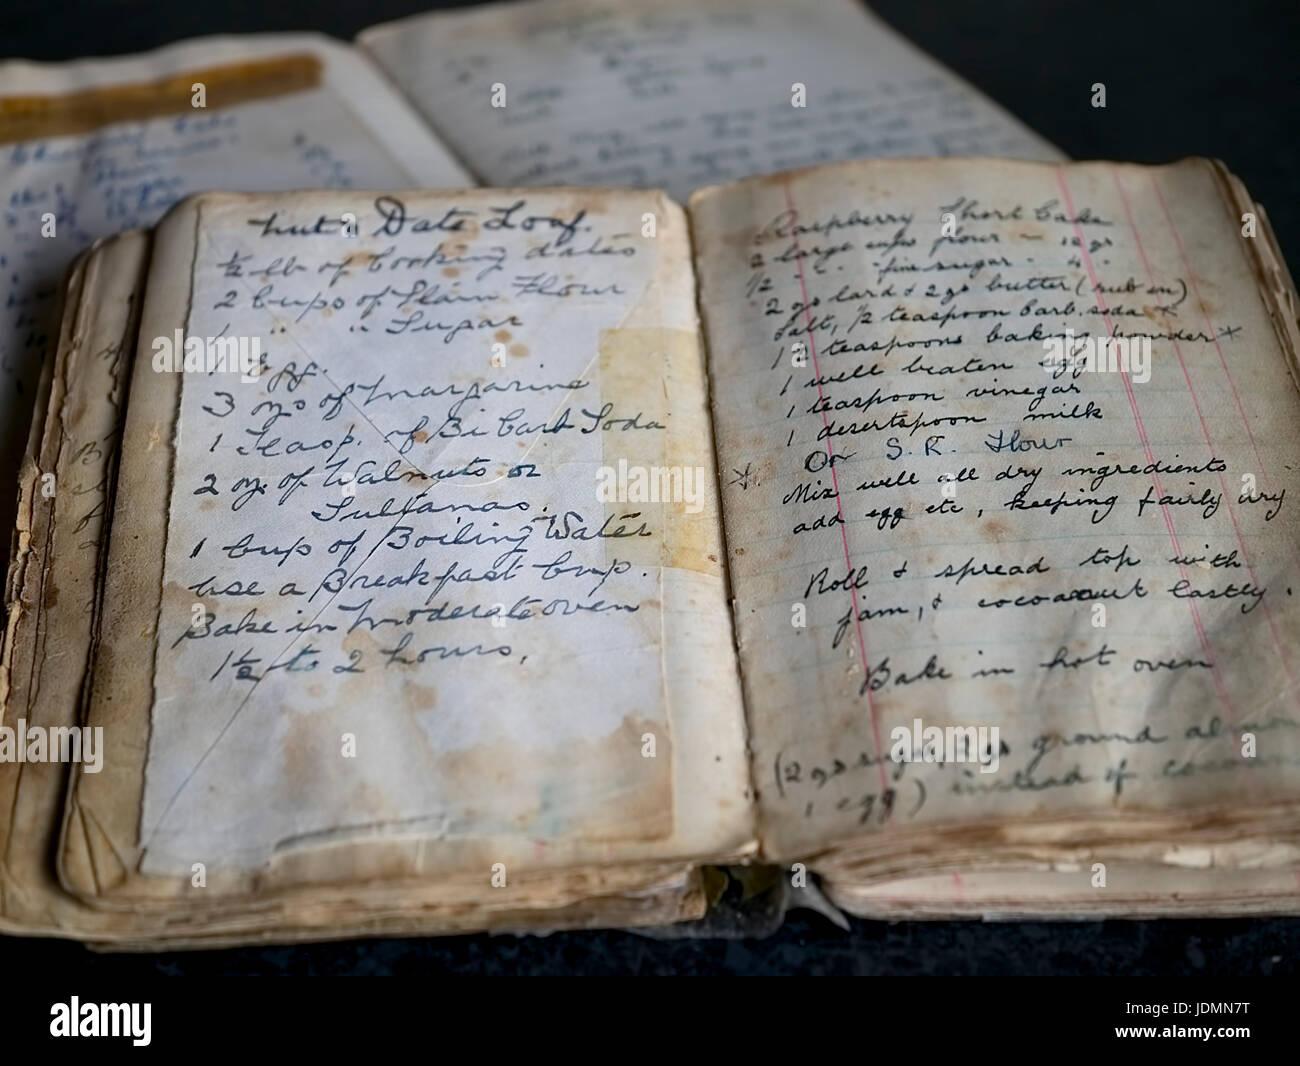 Great Grandmothers recipe book - Stock Image